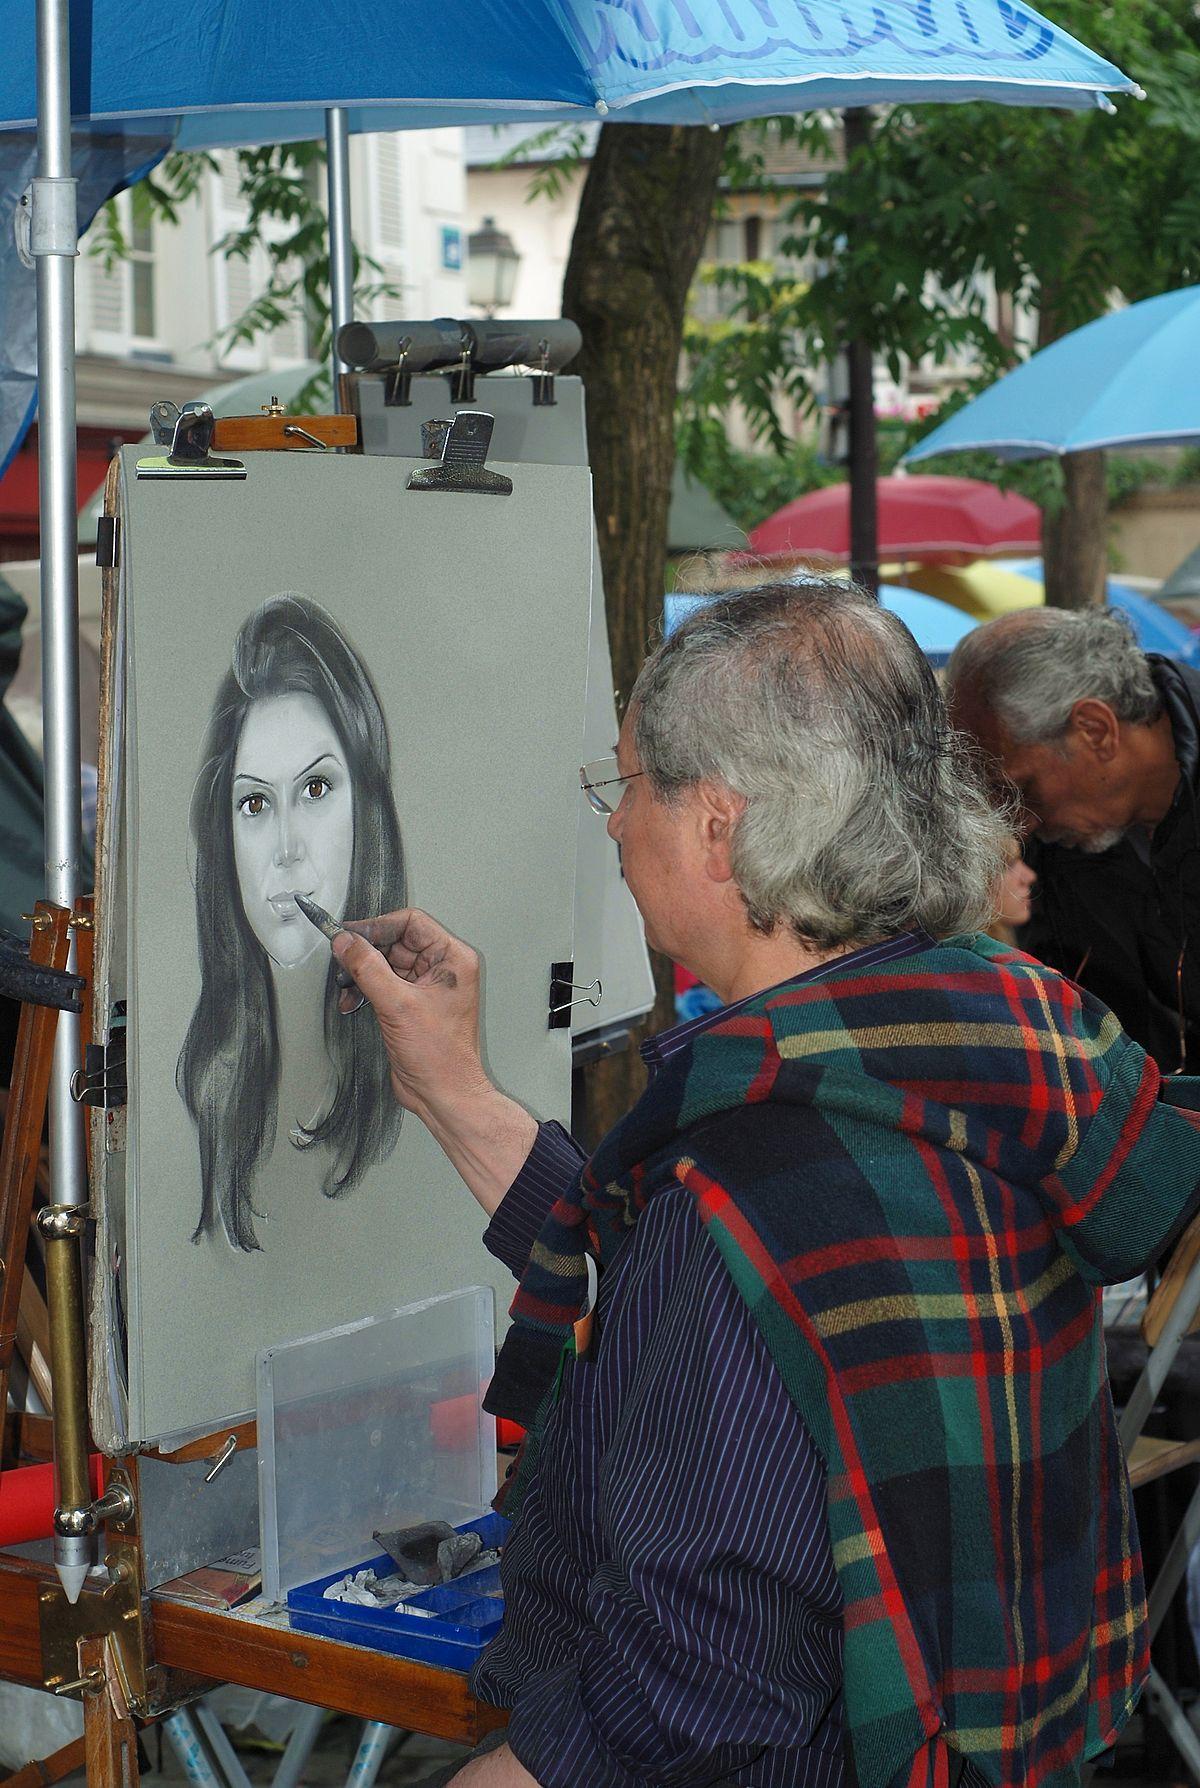 Connu Street artist - Wikipedia PM37